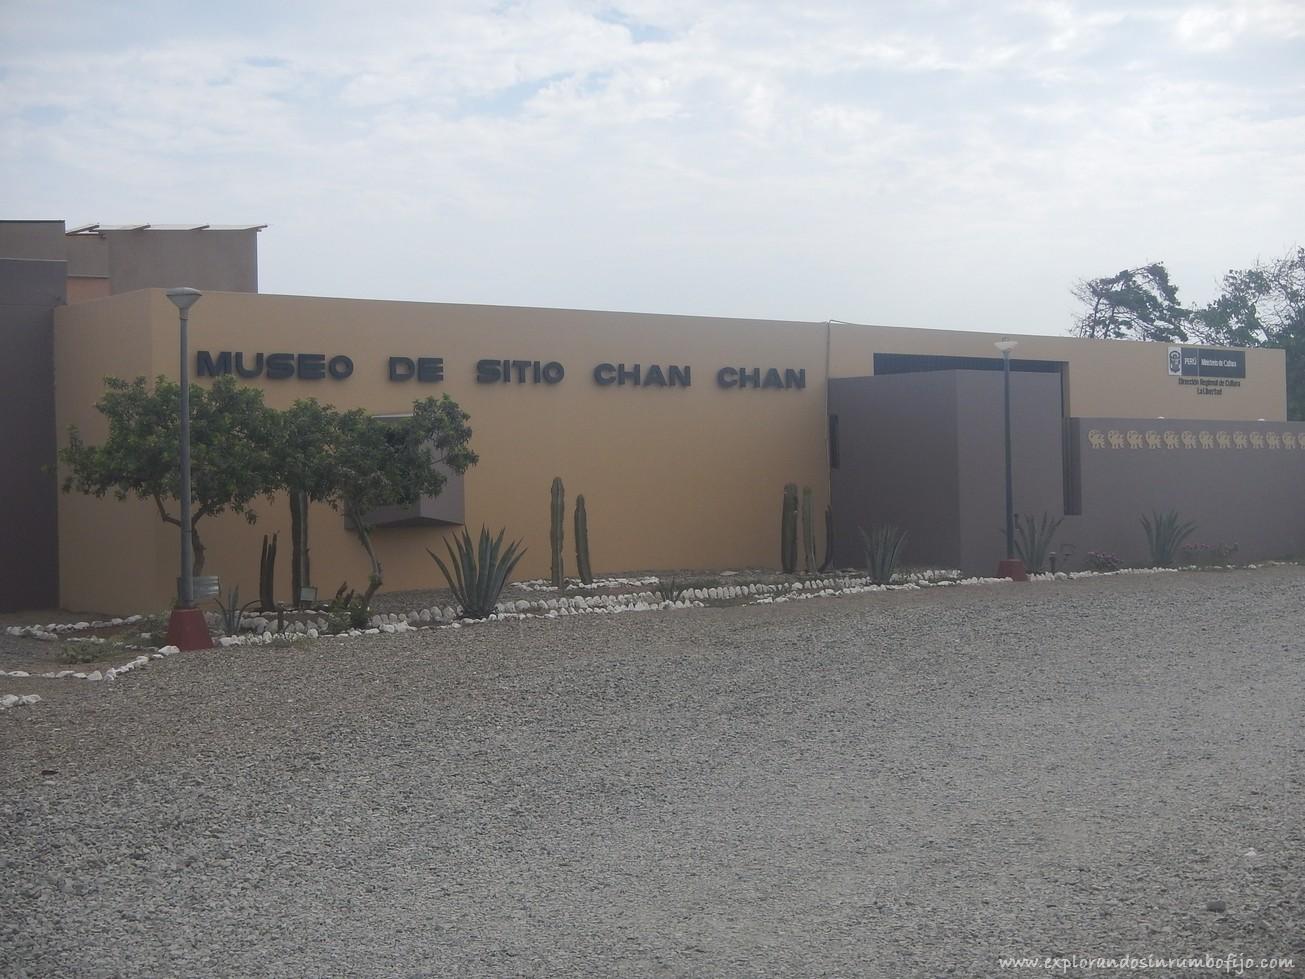 Museo de sitio chan chan trujillo